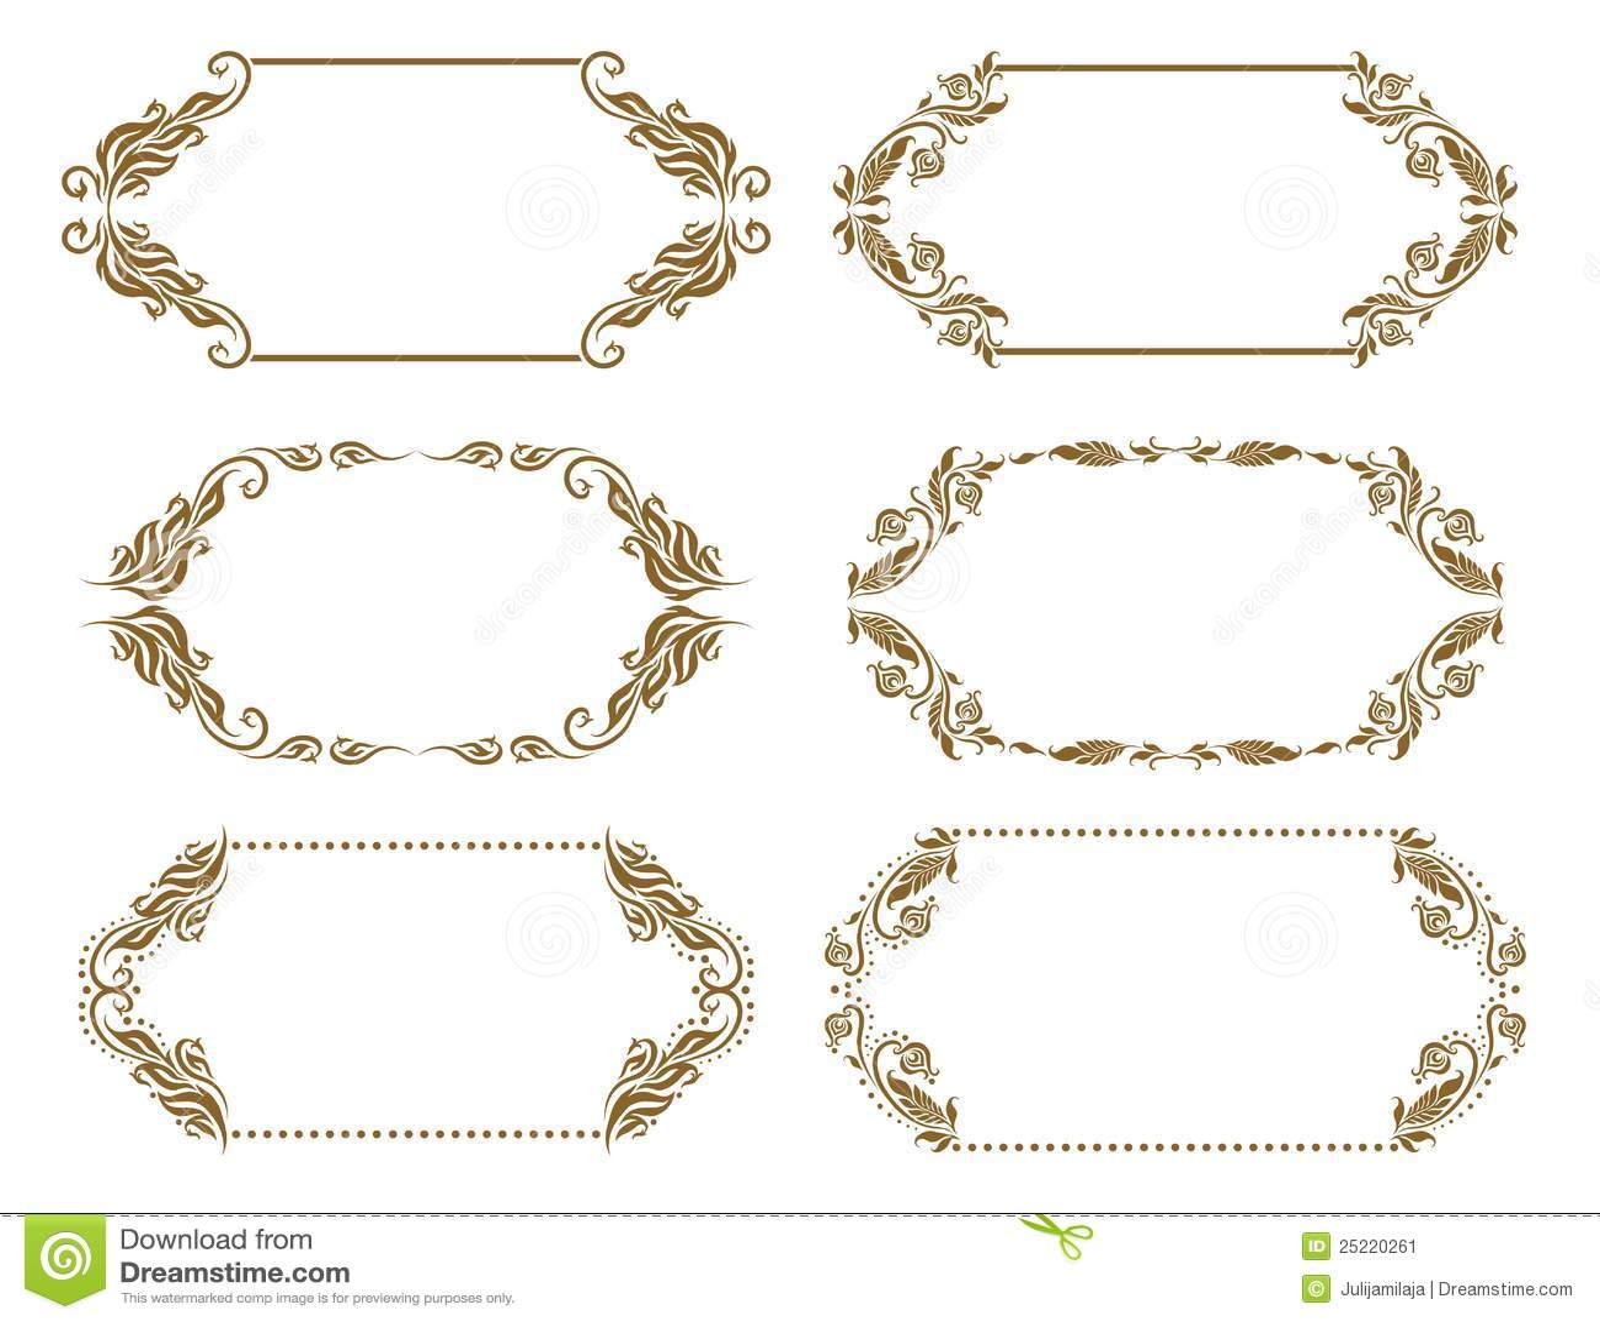 Glasses Frame Vector : Set Of Ornate Vector Frames Stock Image - Image: 25220261